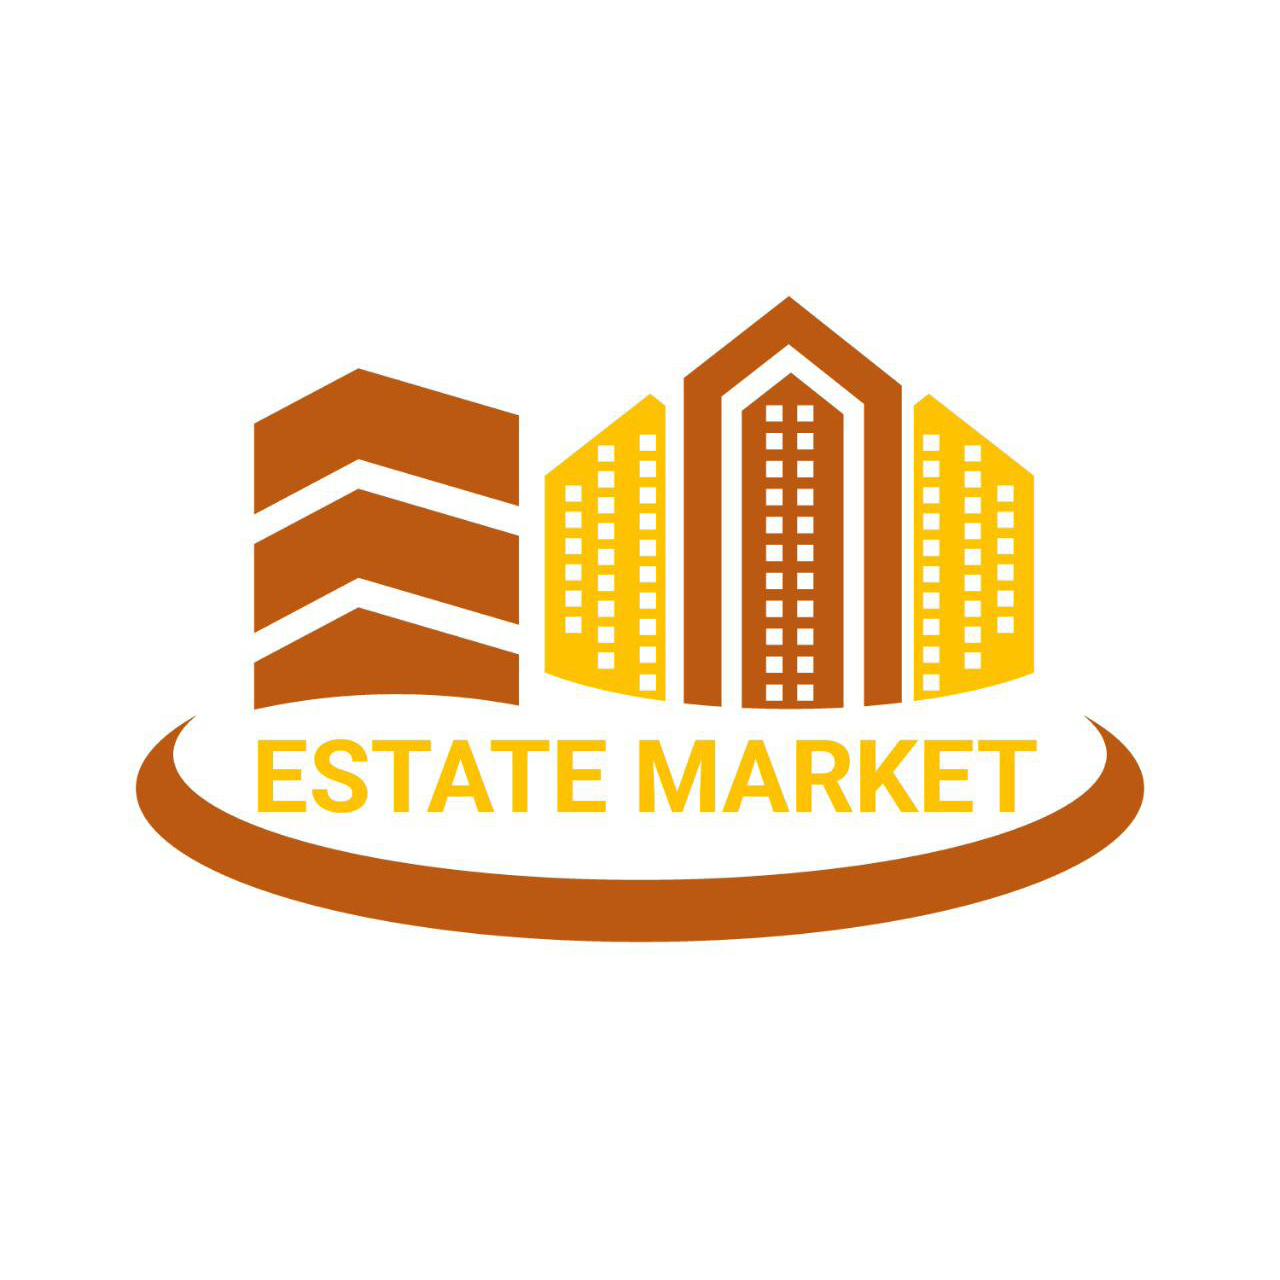 Estate Market